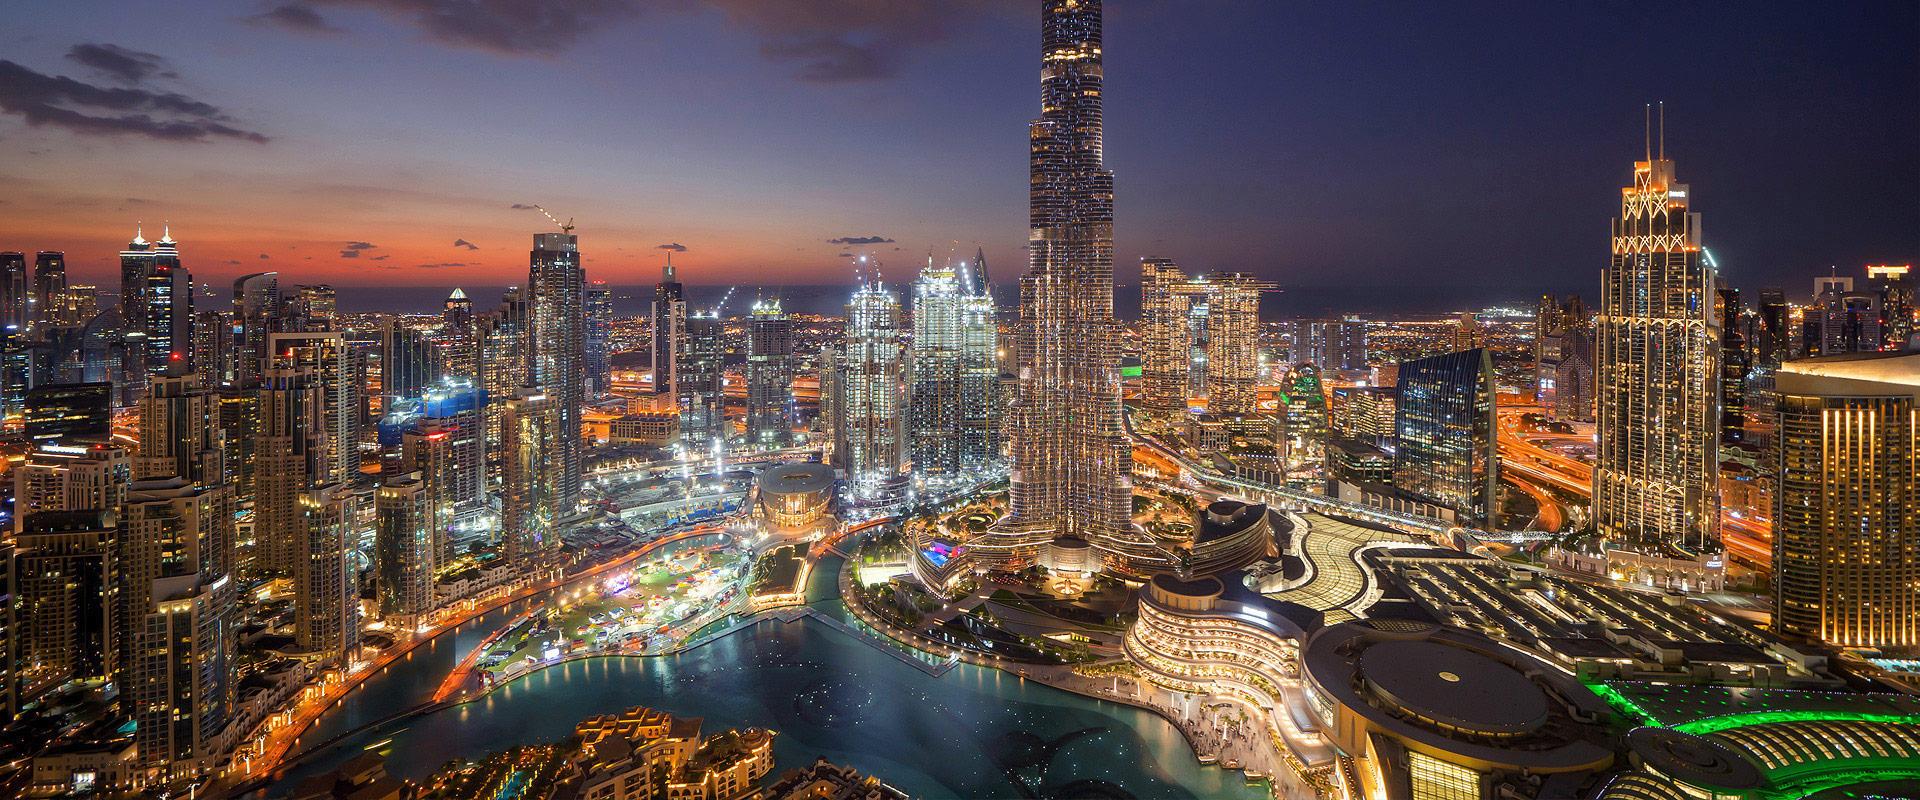 Dubai entry requirements